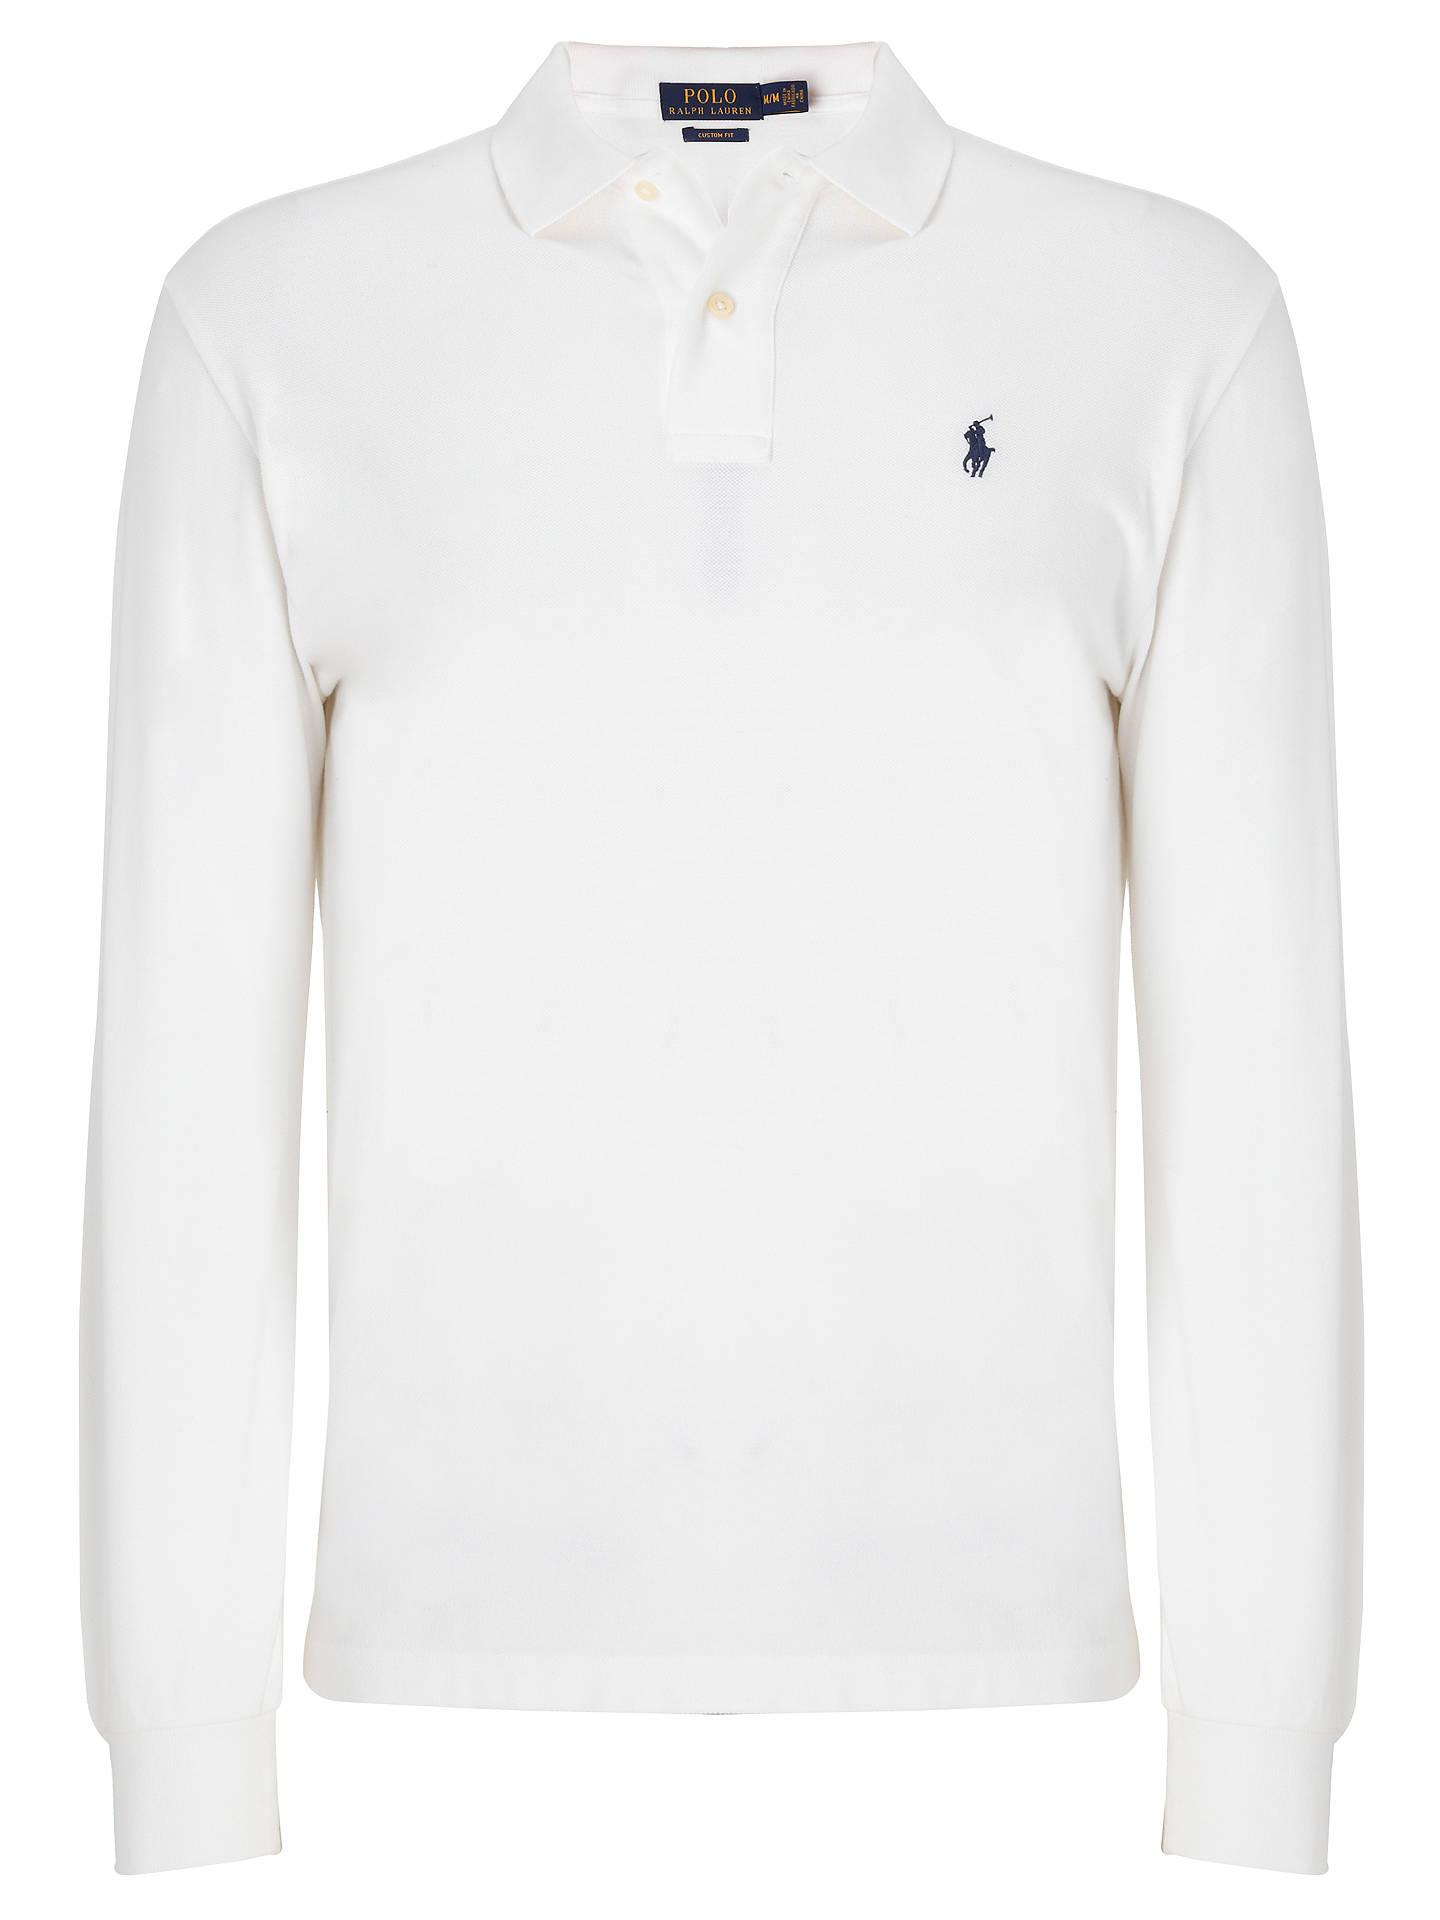 9495cd80 Polo Ralph Lauren Custom Fit Long Sleeve Polo Shirt, White at John ...